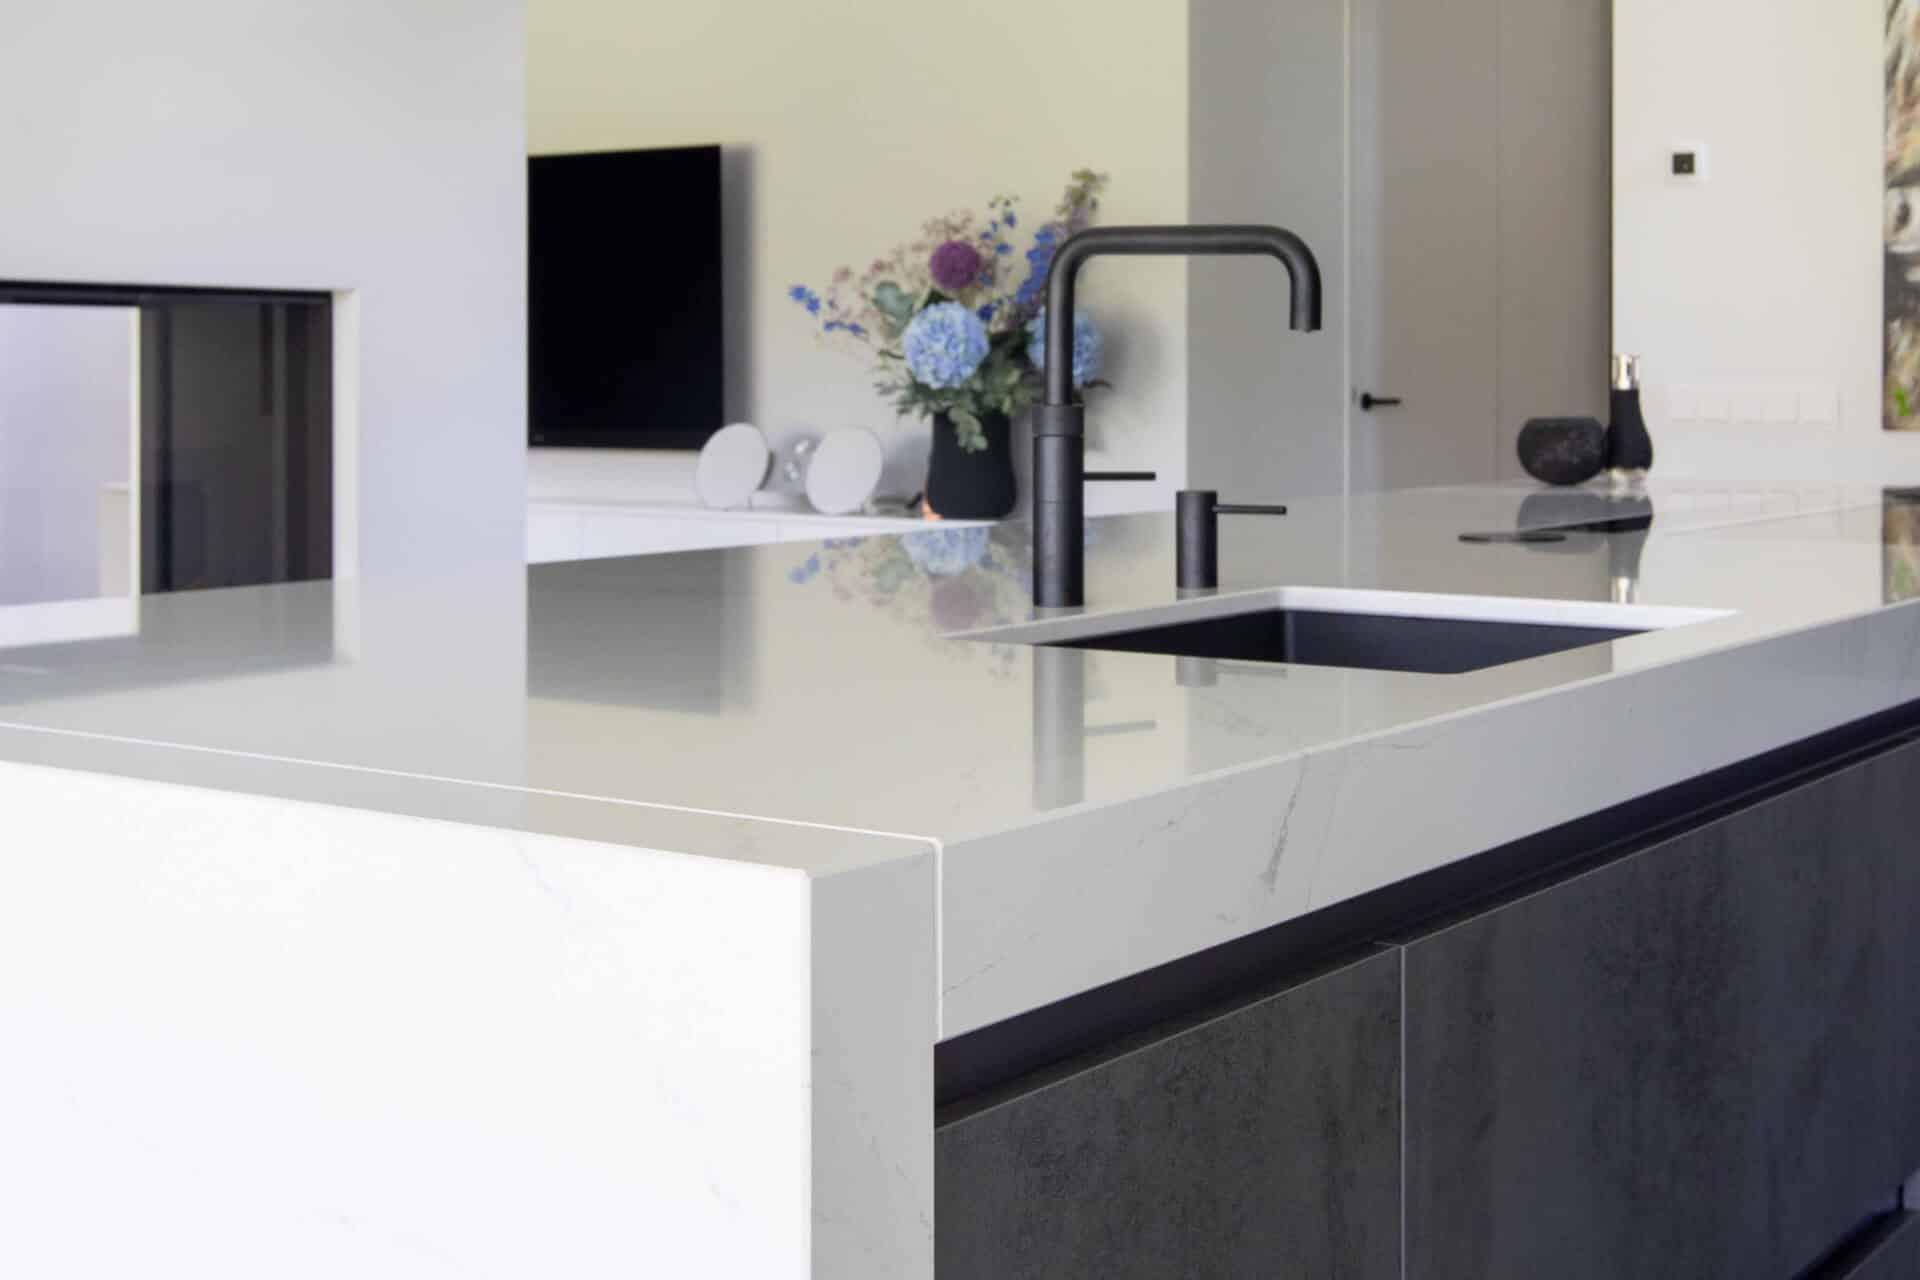 Luxe Design Keuken Lochem Van Ginkel Keukens Barneveld 025